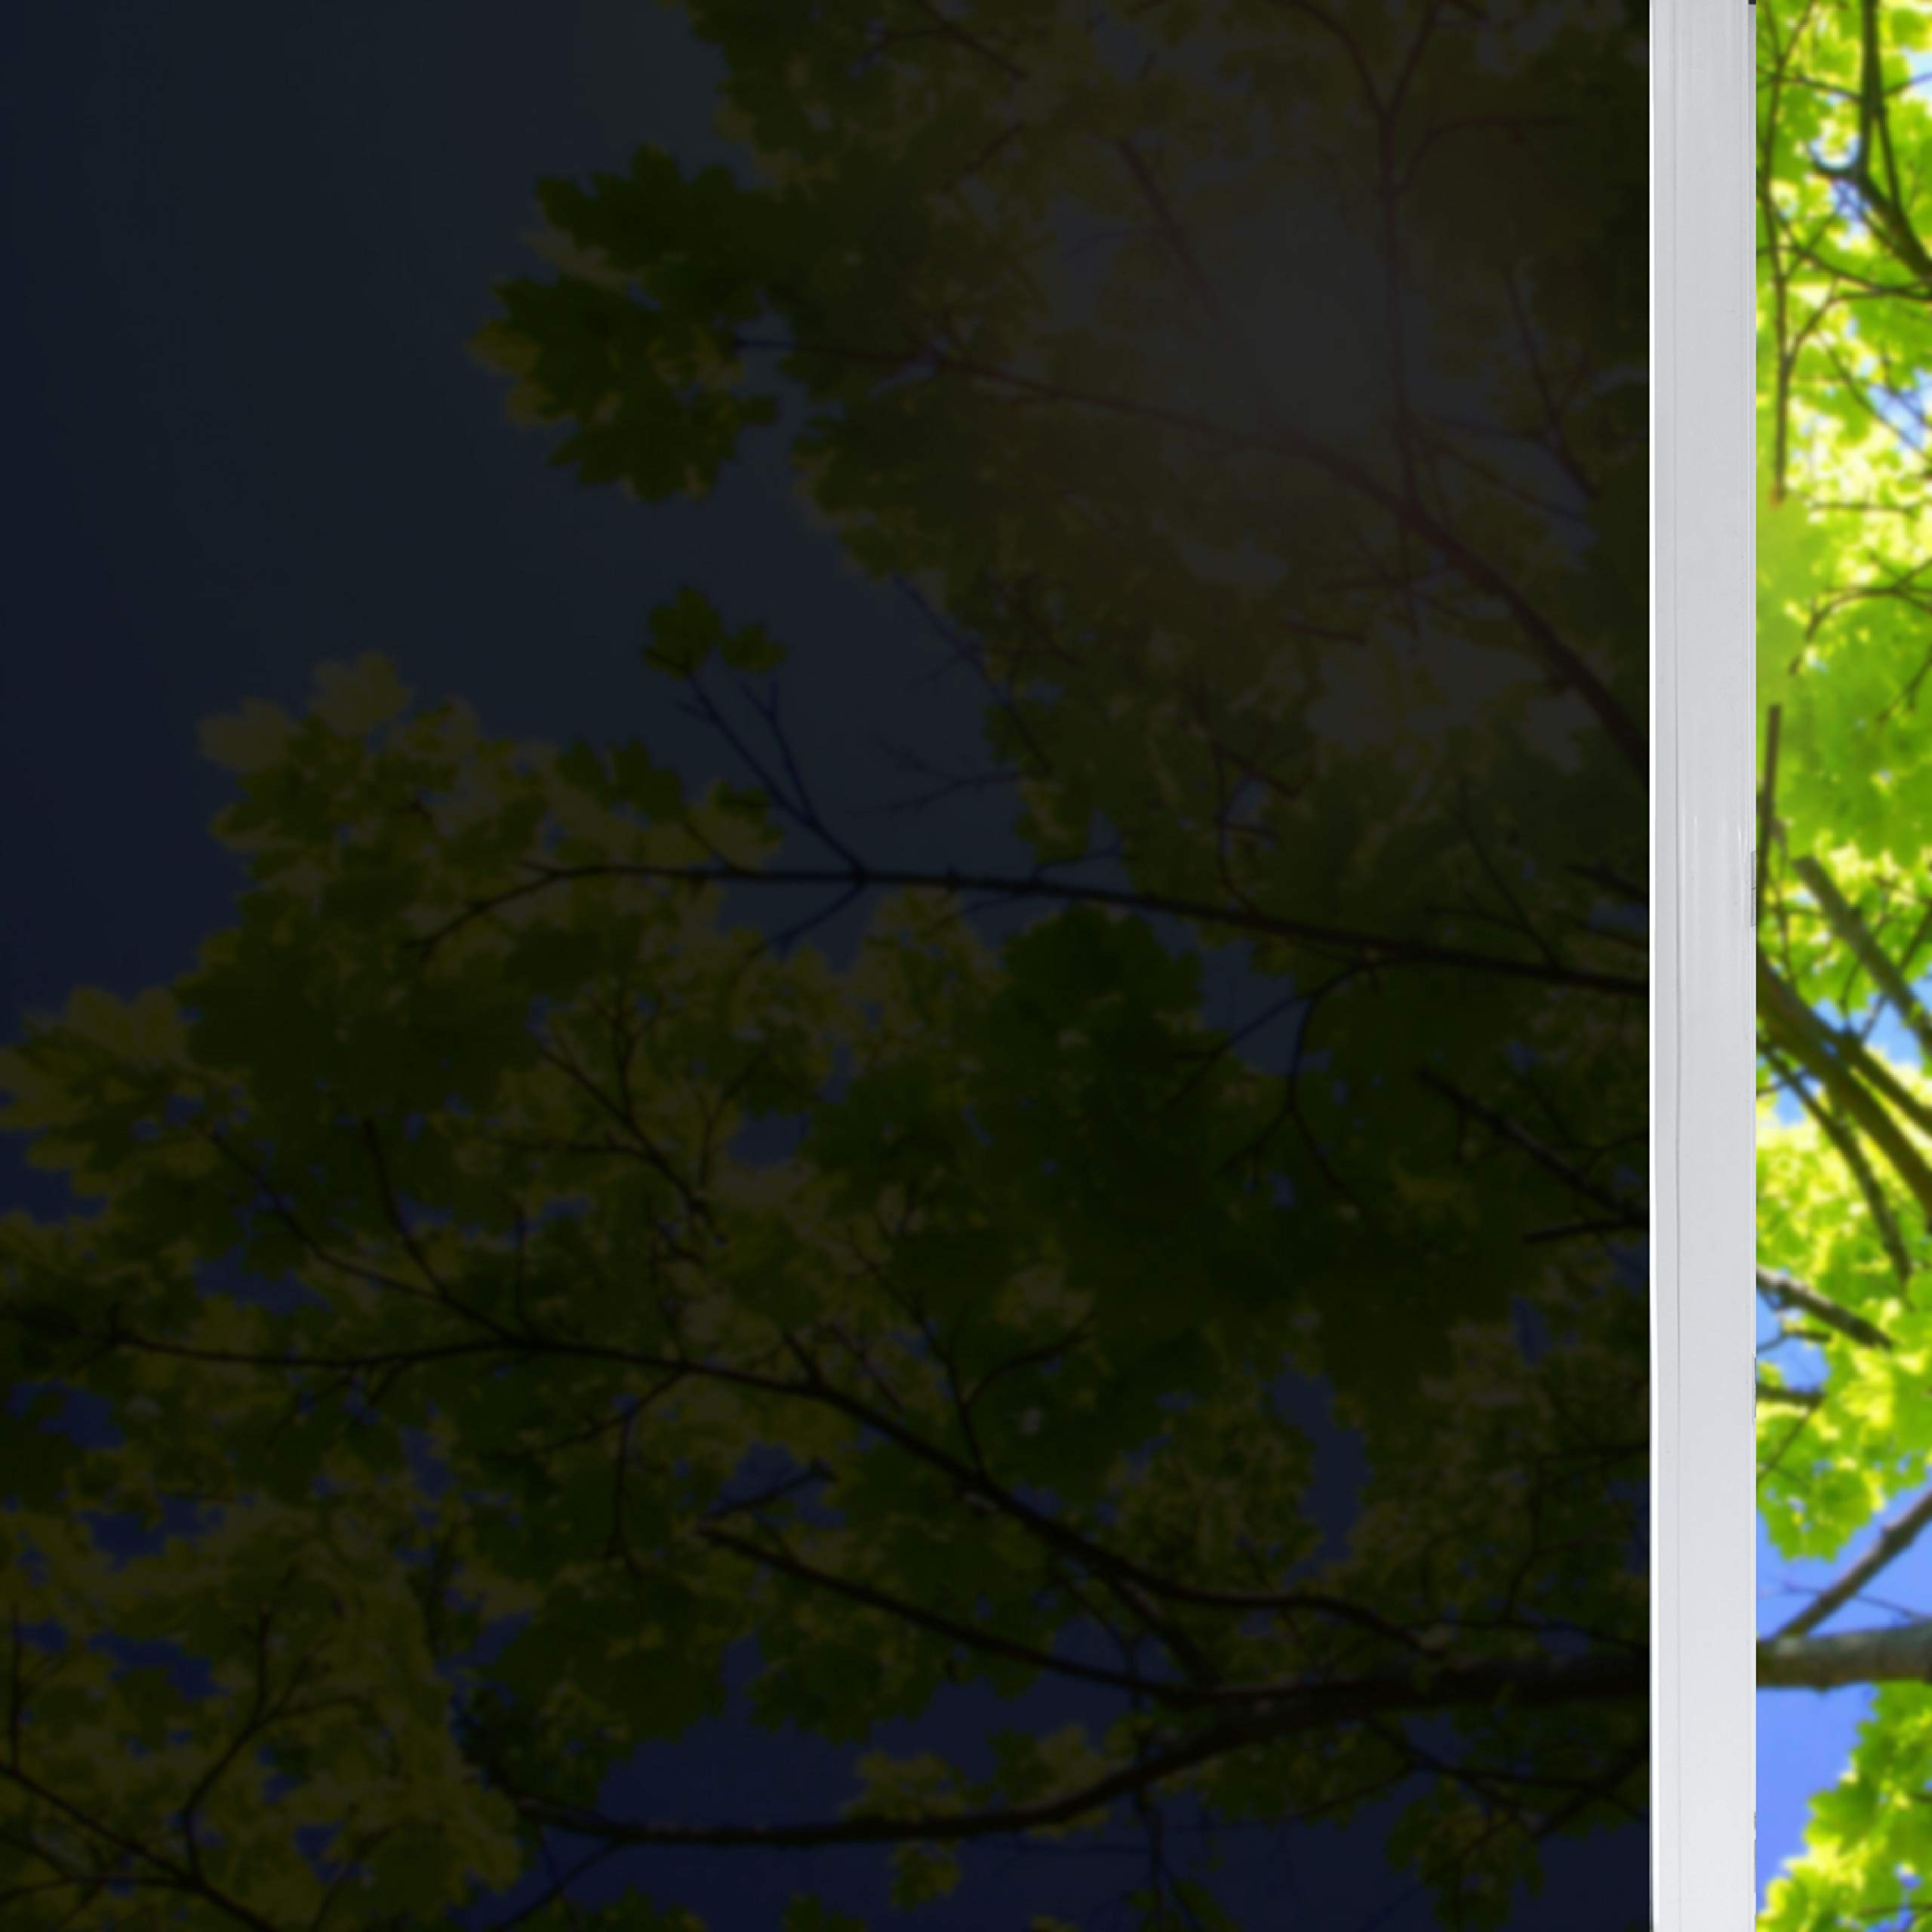 solardiamond Window Film Privacy Heat Control Sun Blocking Insulation Film Decorative Residential UV Protection Window Tint Roll for Glass for Home Meeting Living Room & Car | 5% Dark Black 40inX15ft